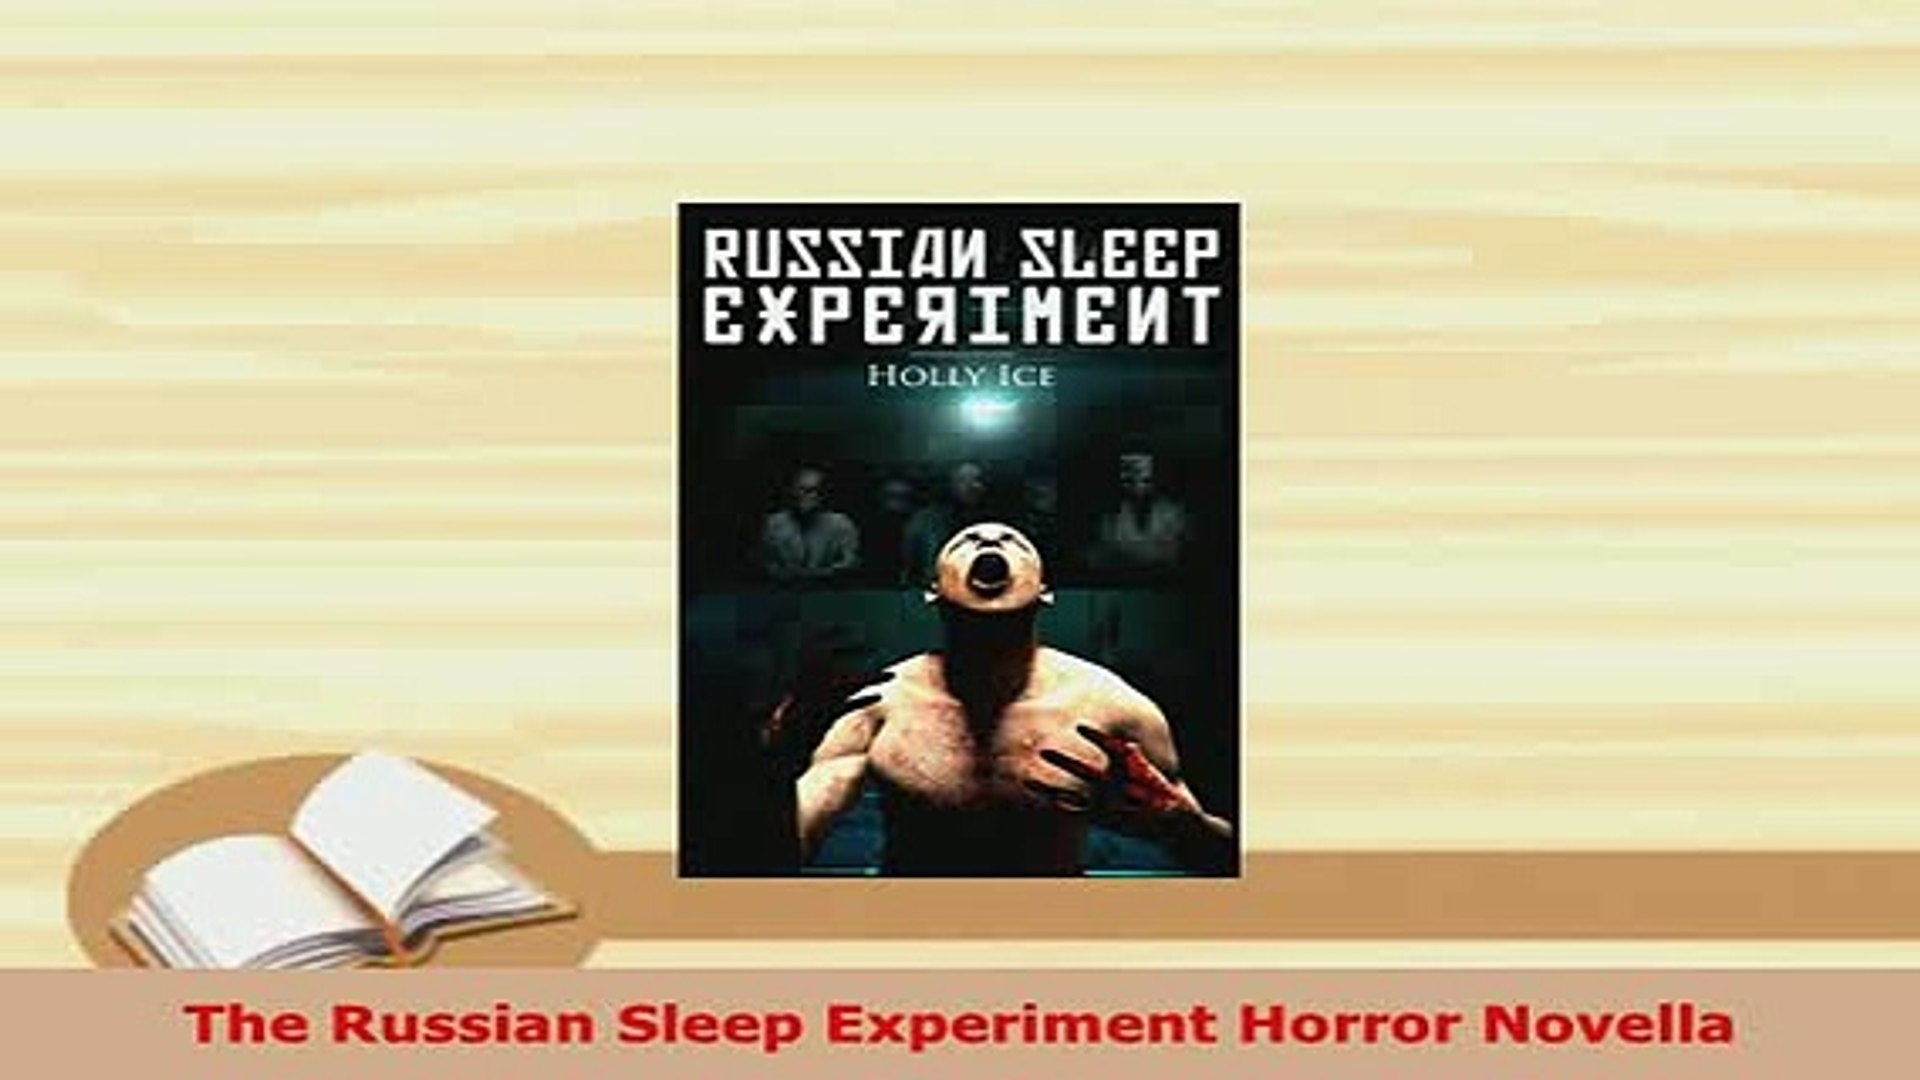 The Russian Sleep Experiment Horror Novella